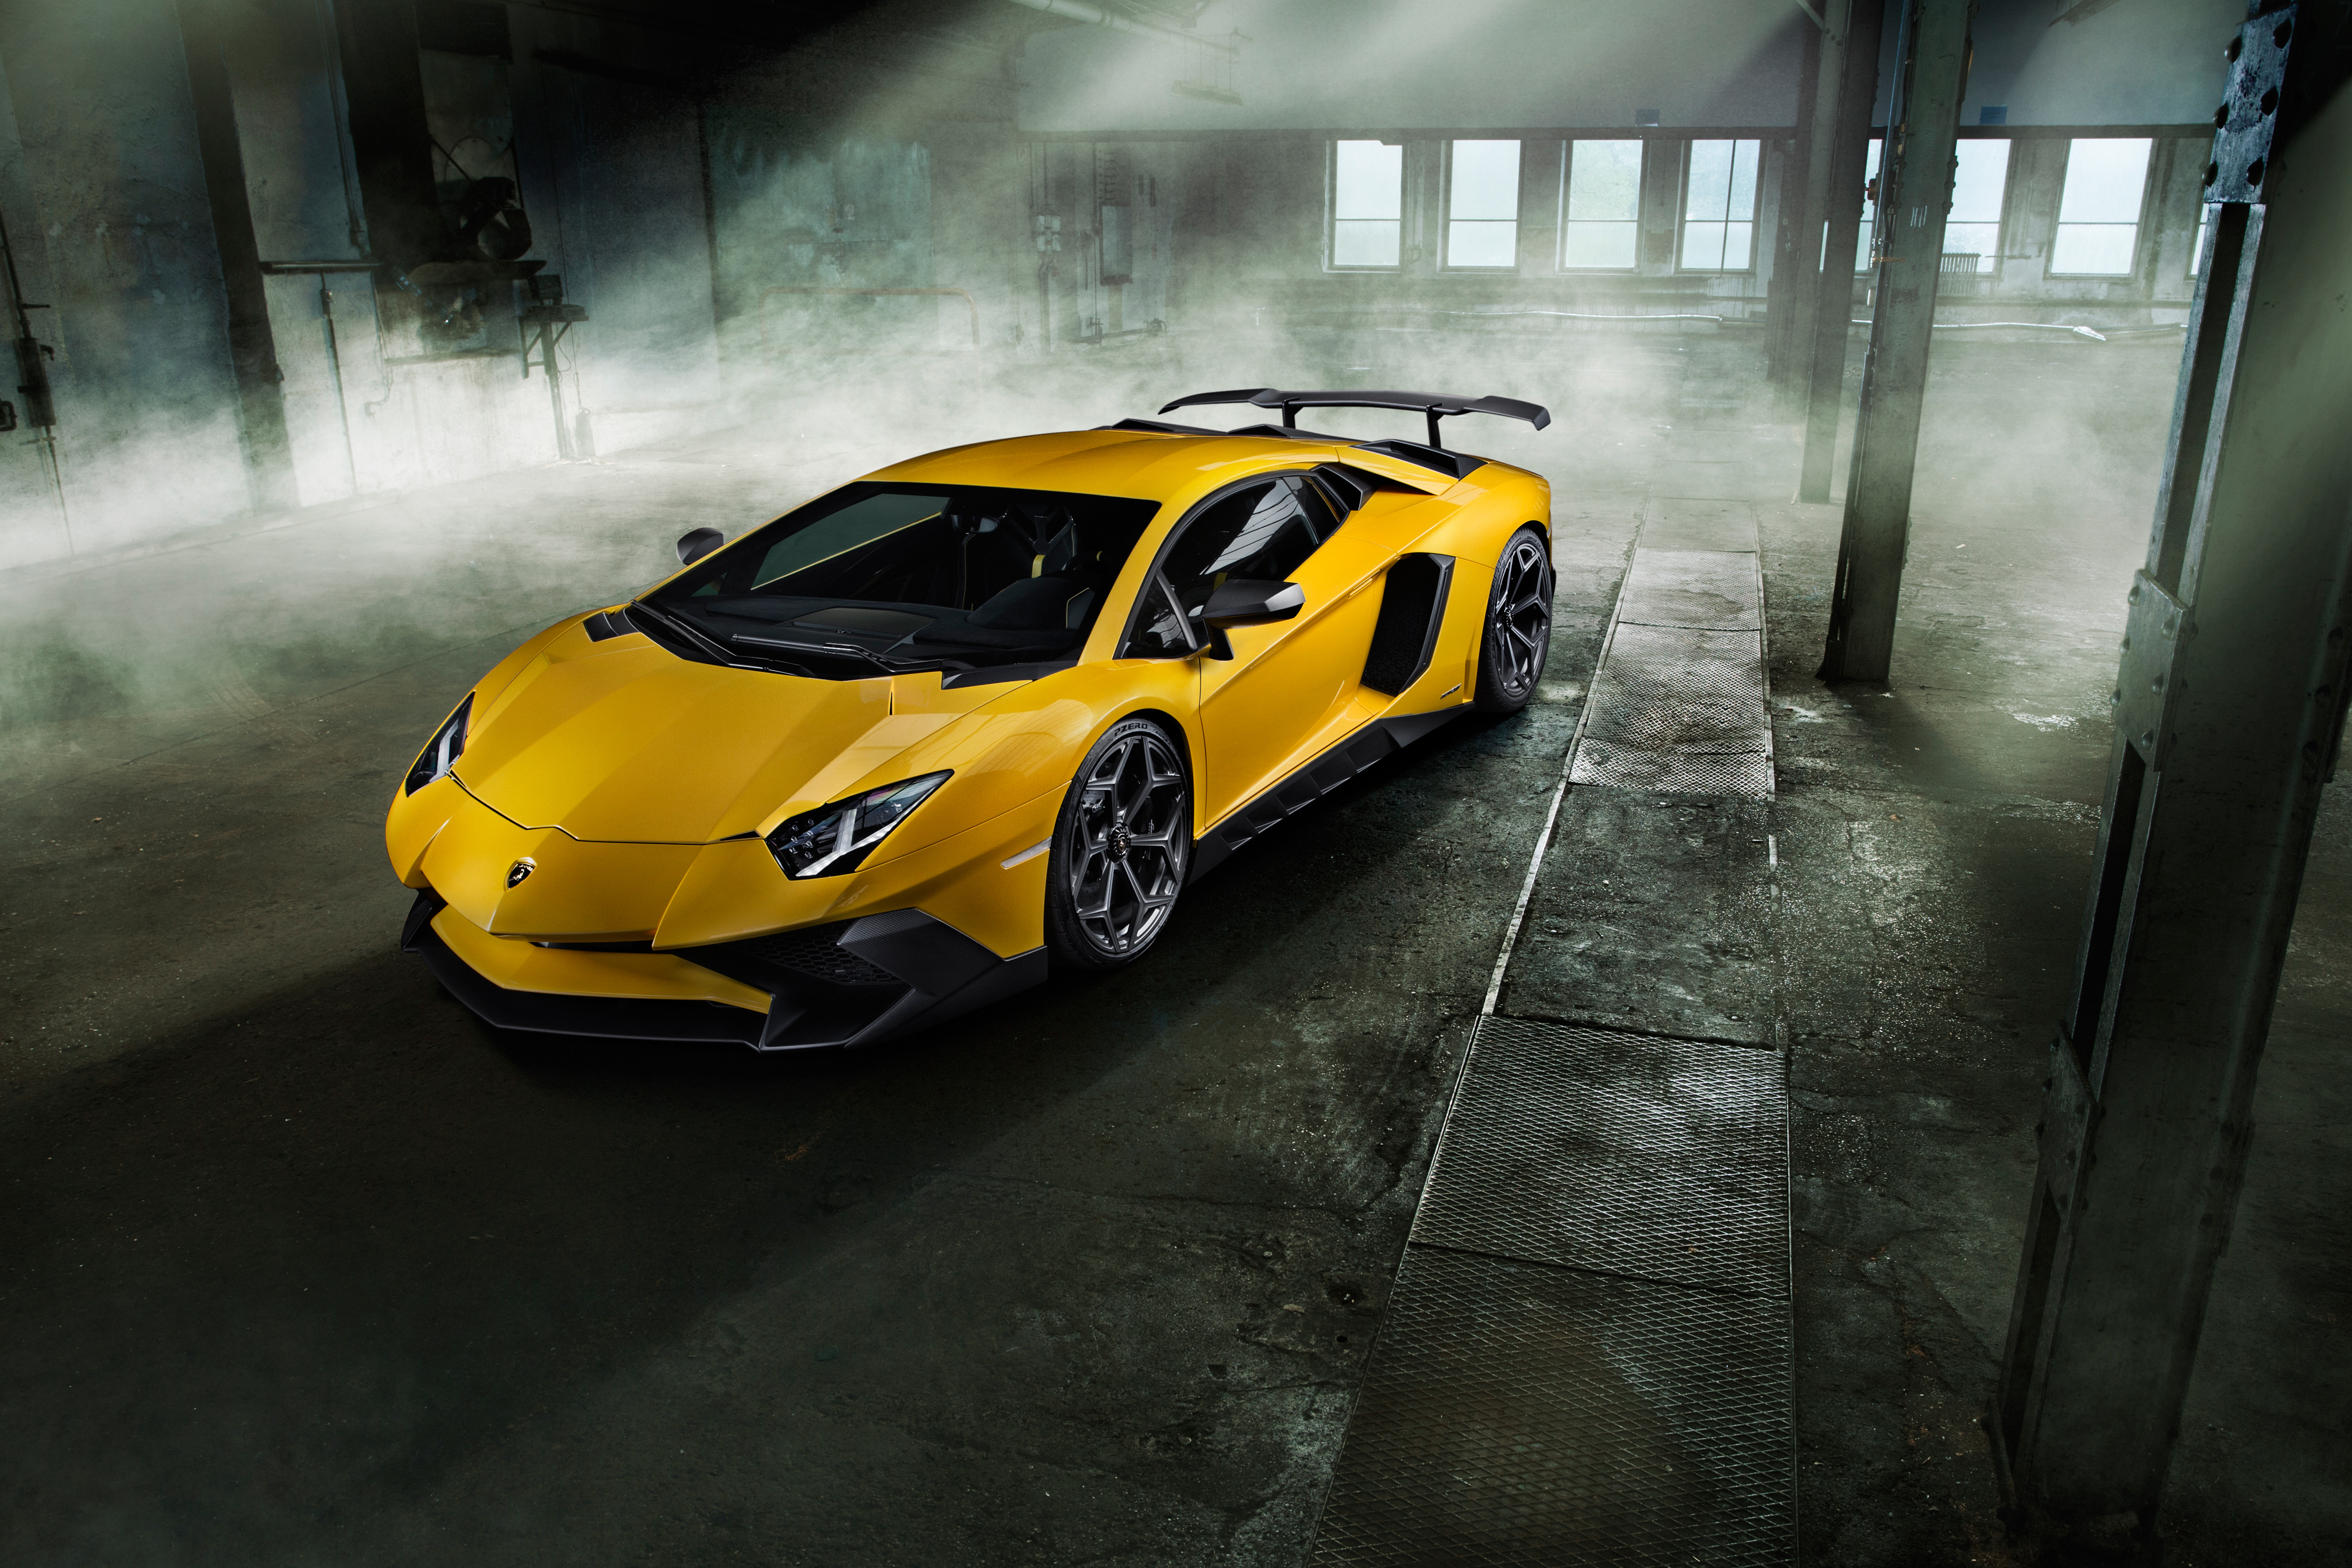 132766 Novitec Torado Lamborghini Aventador SV Cars and Bikes 4096x2731